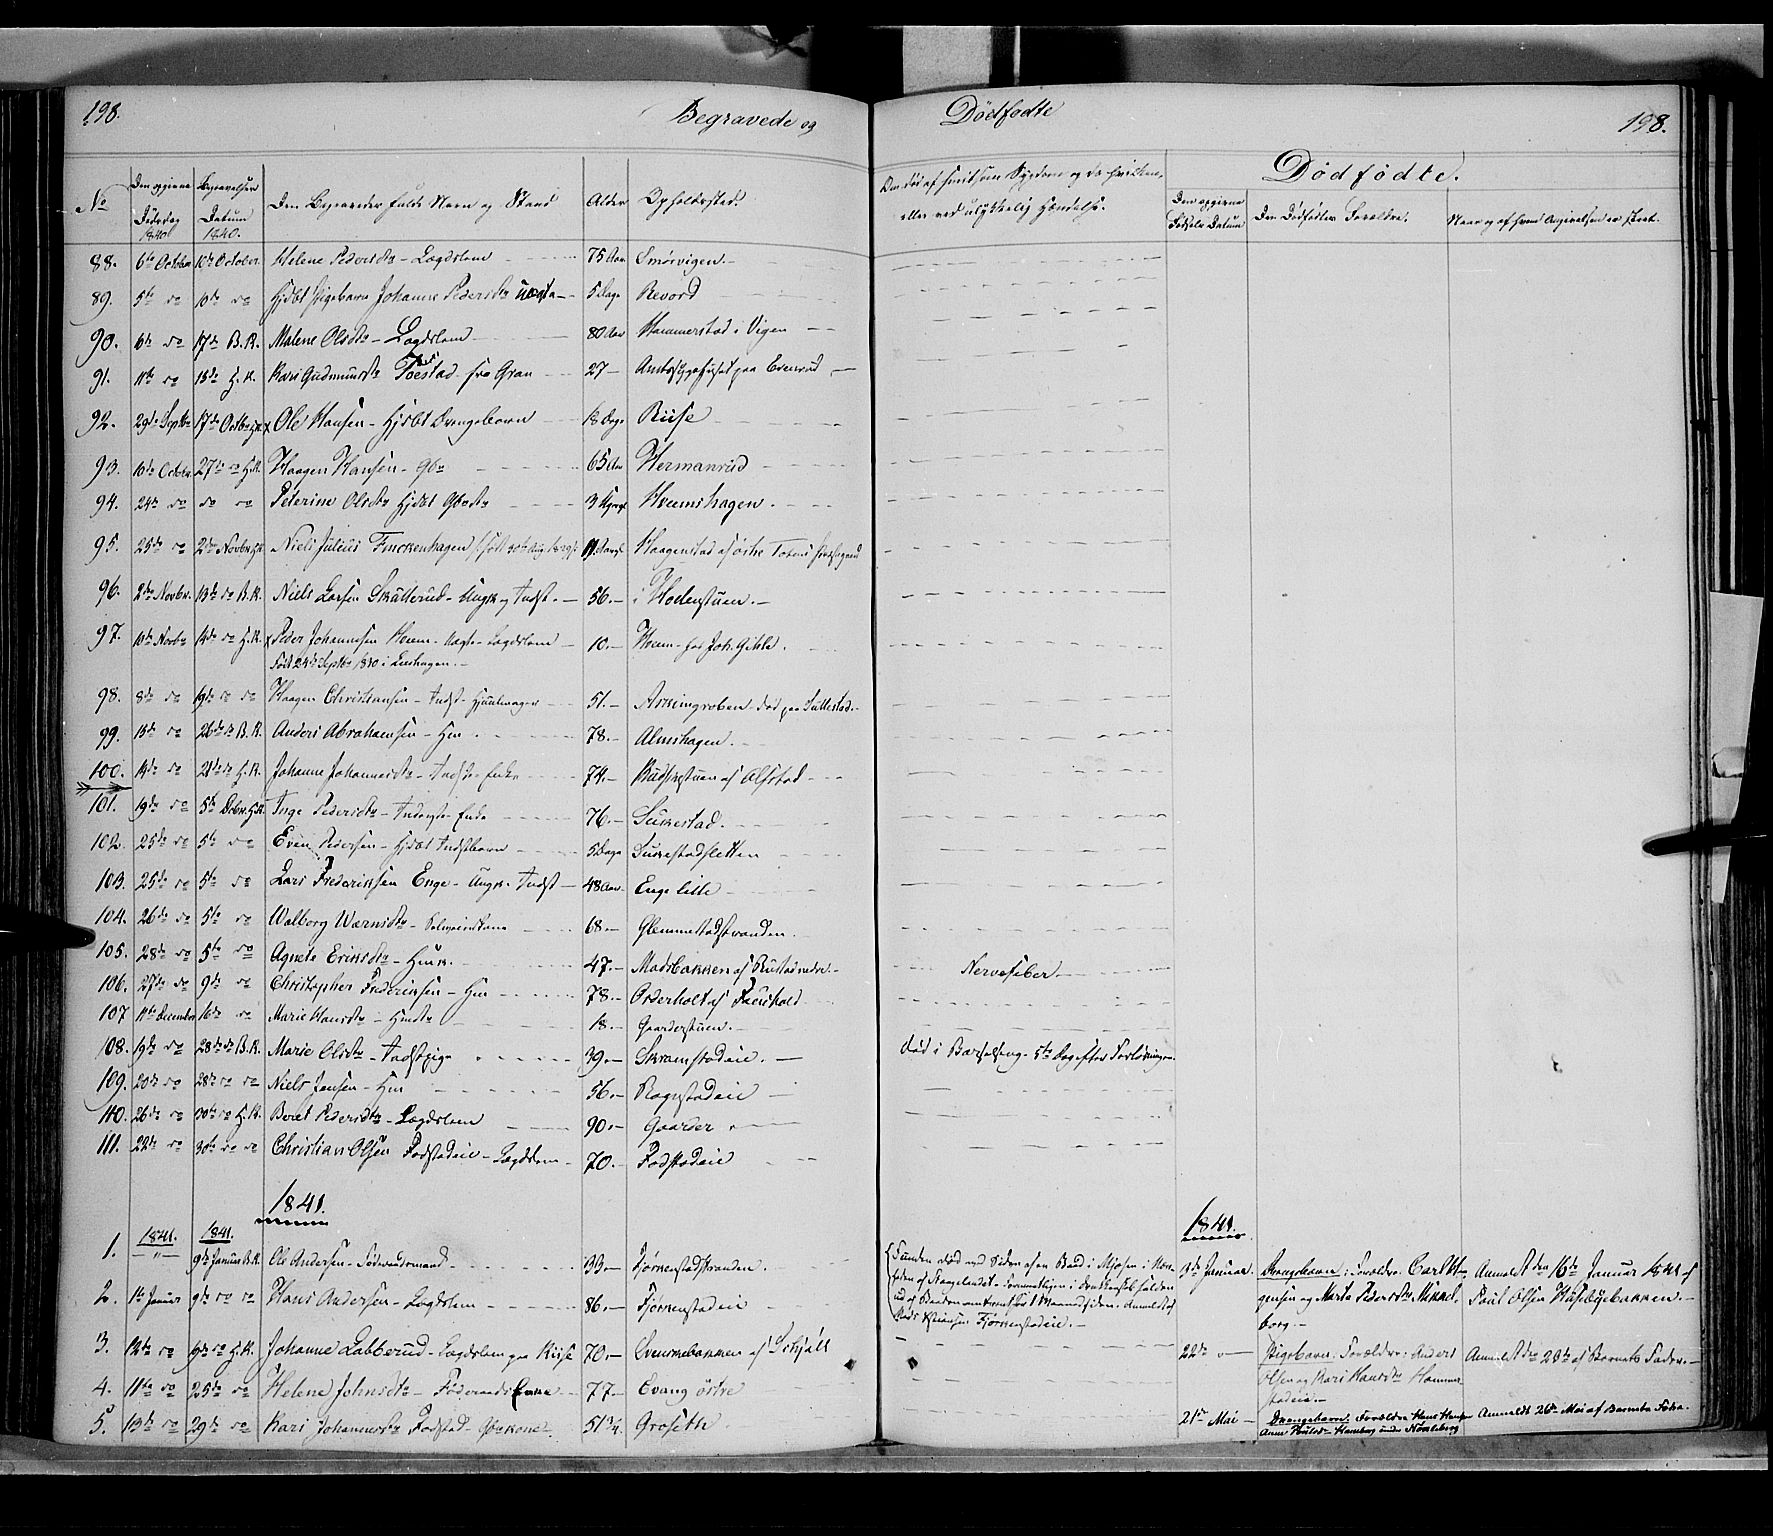 SAH, Østre Toten prestekontor, Ministerialbok nr. 2, 1840-1847, s. 198